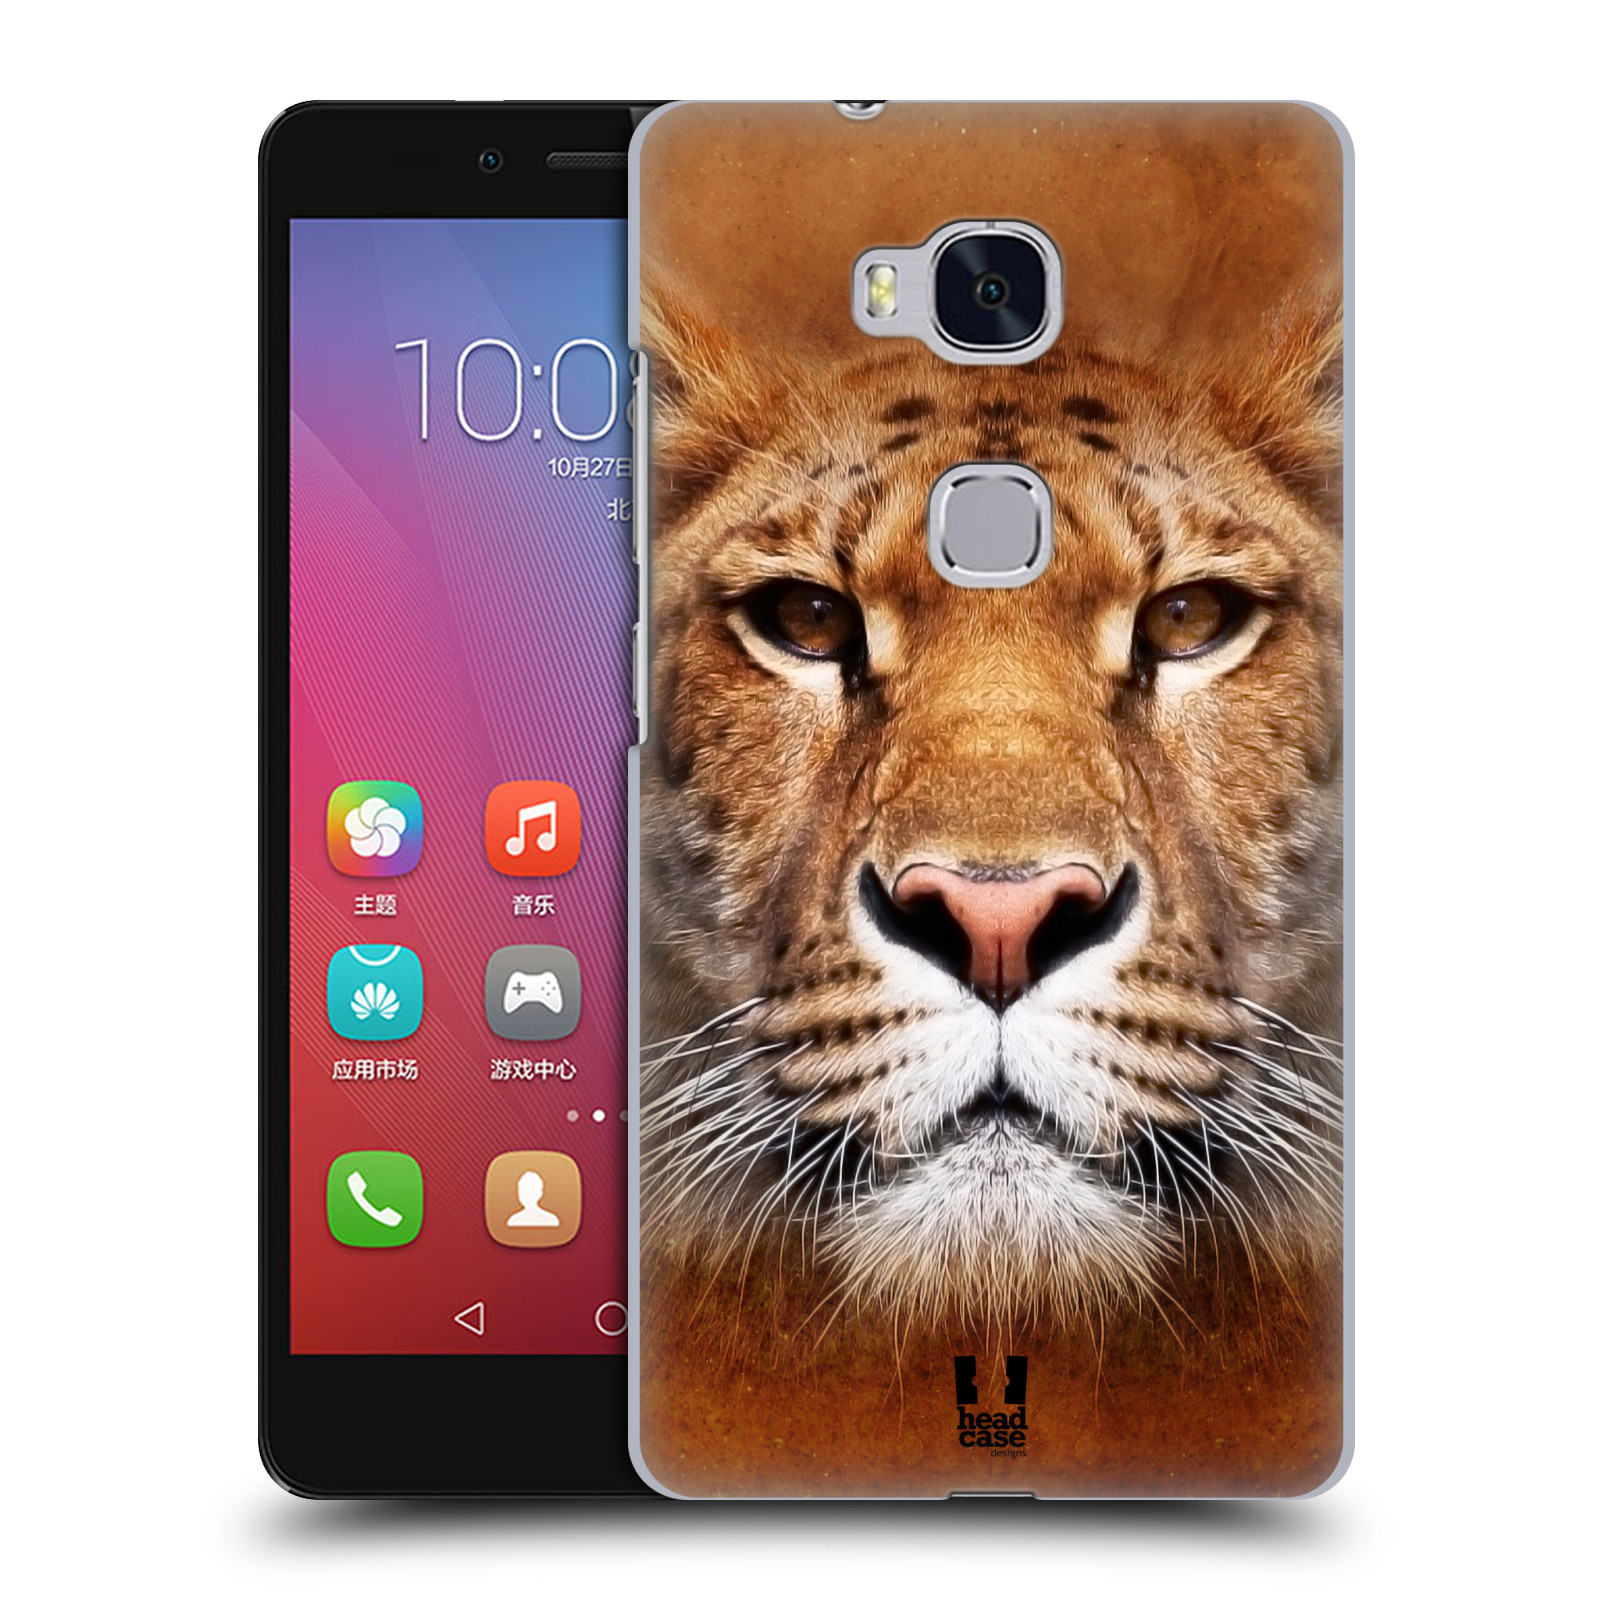 HEAD CASE pevný plastový obal na mobil HUAWEI HONOR 5X vzor Zvířecí tváře Sibiřský tygr